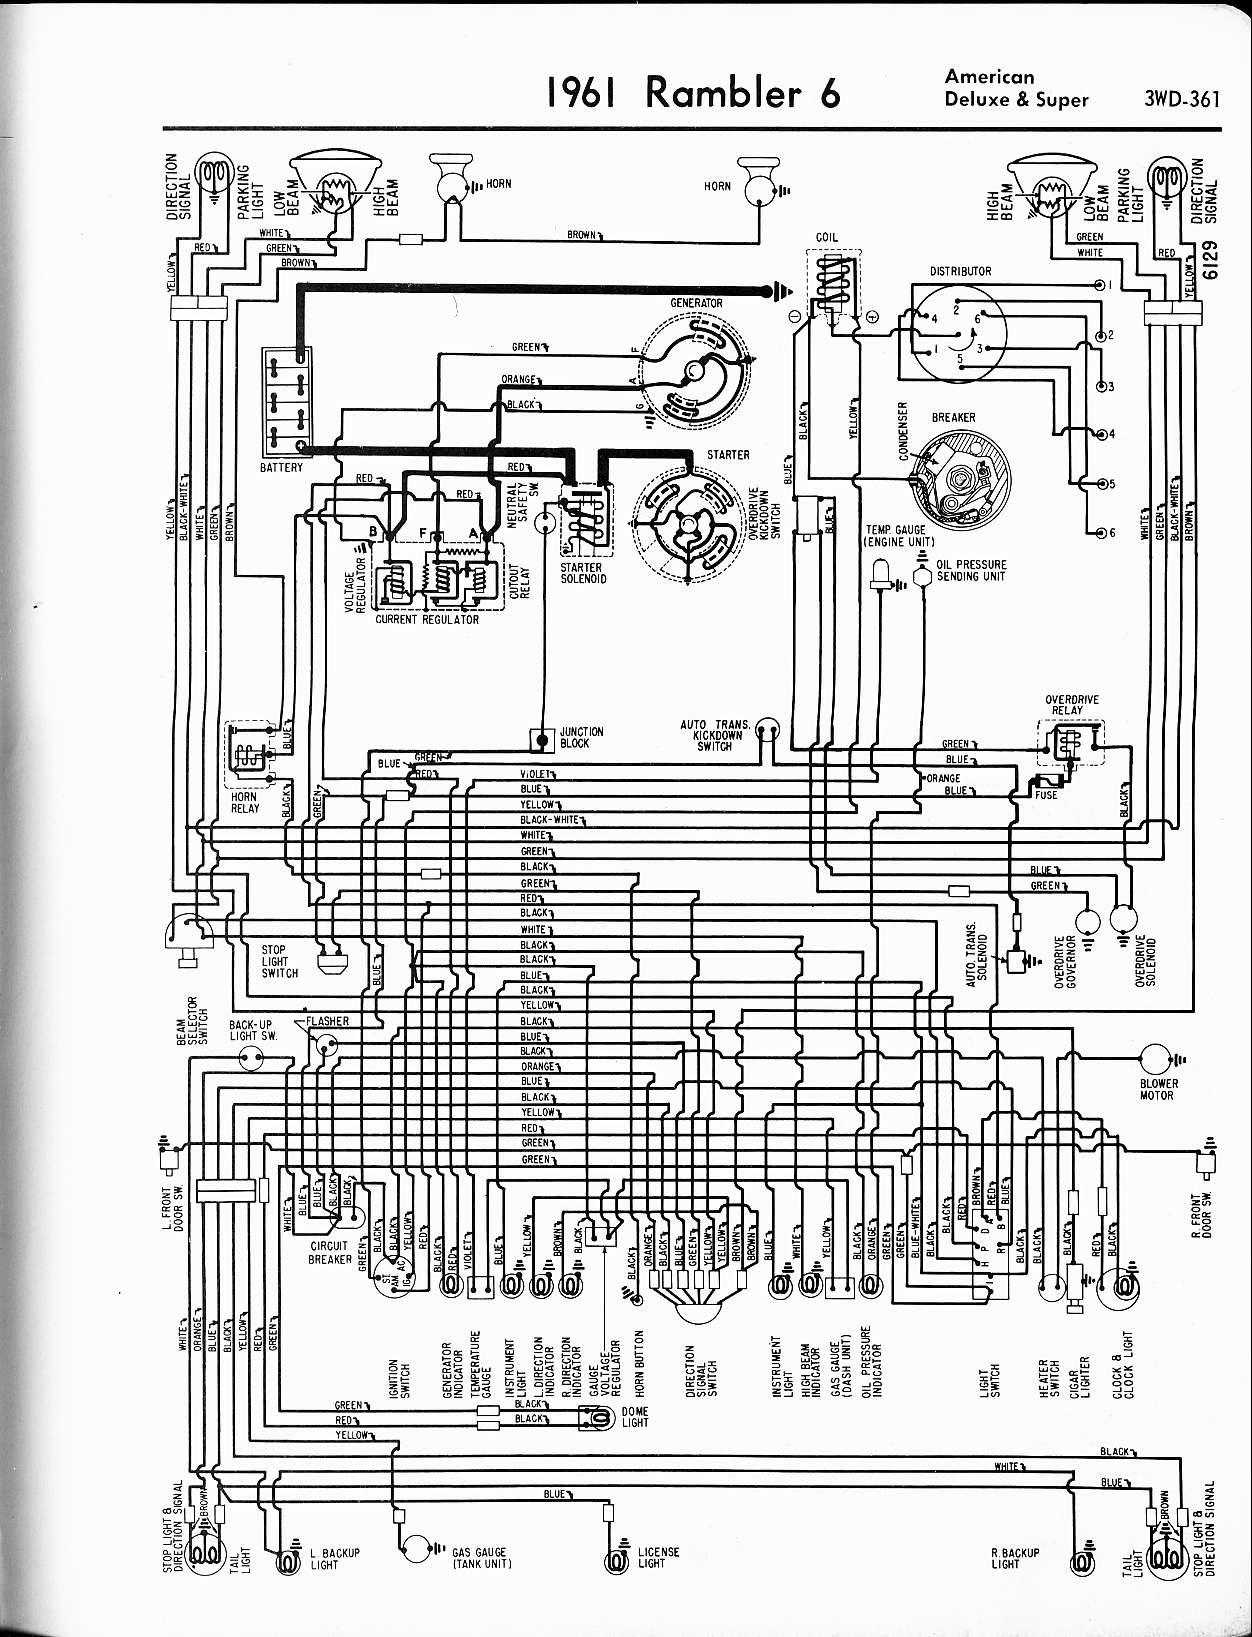 1960 f100 wiring diagram hino truck engine diagram rj11 jack, Wiring diagram